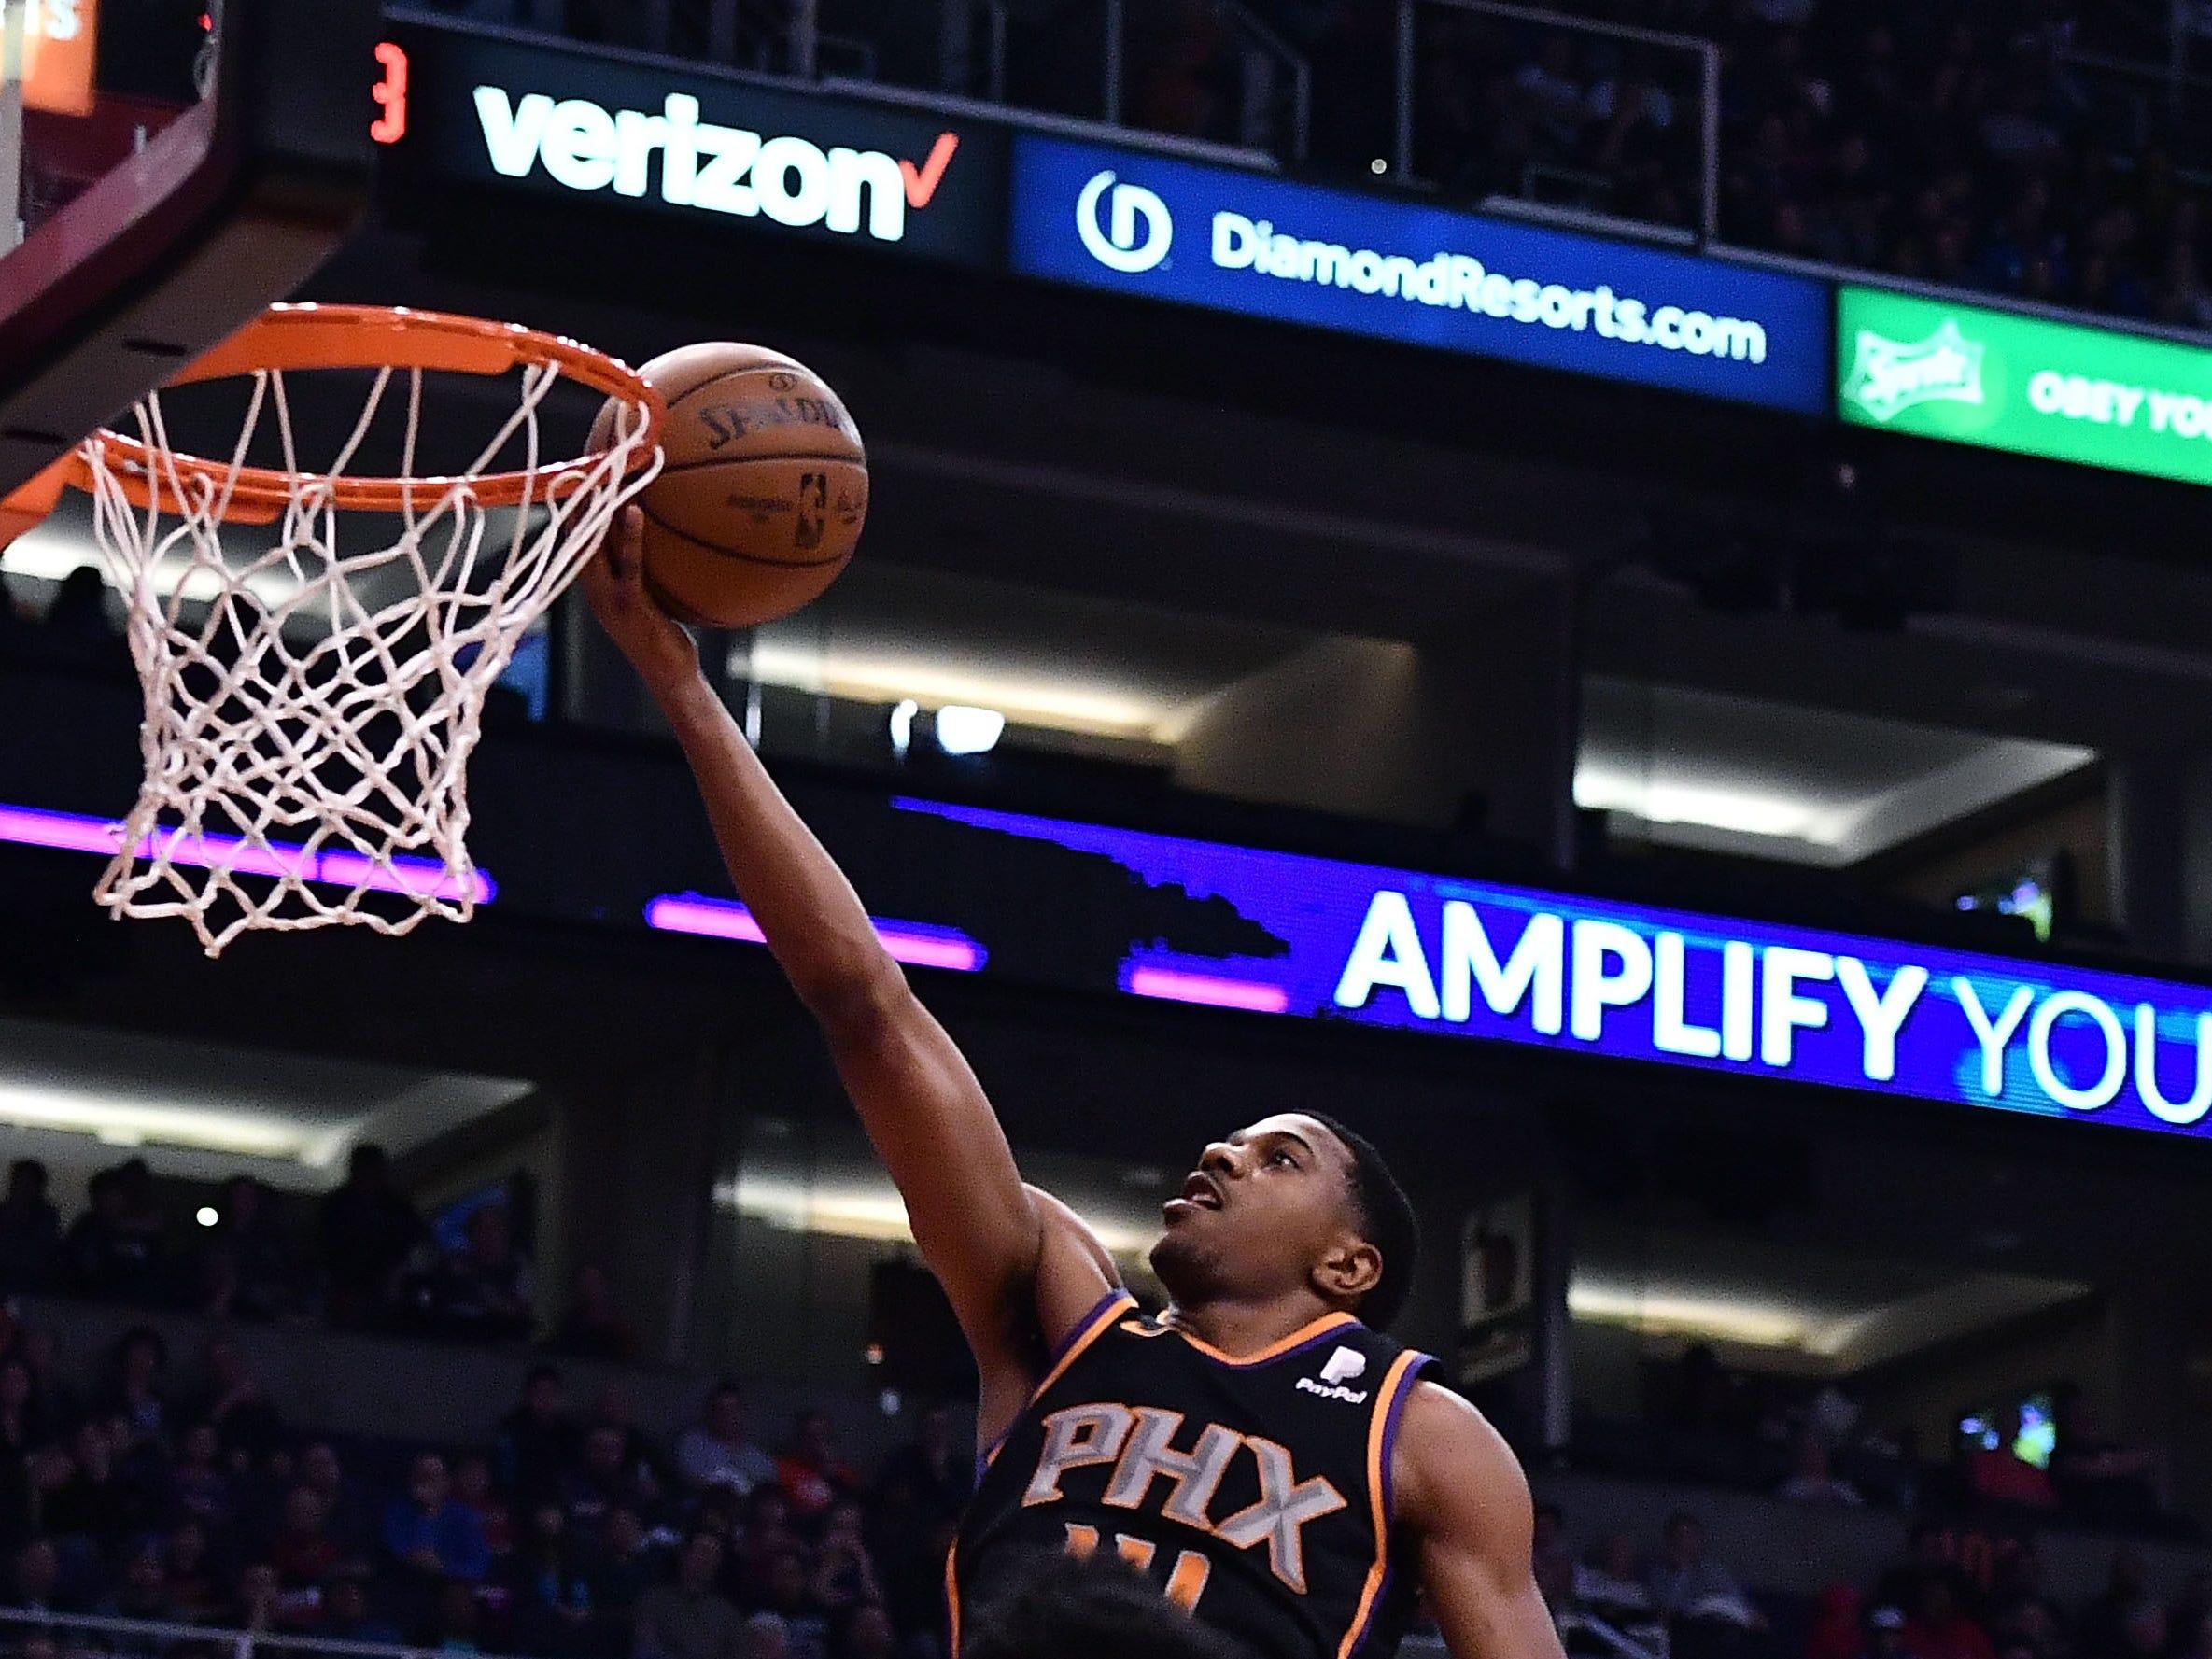 Jan 4, 2019; Phoenix, AZ, USA; Phoenix Suns guard De'Anthony Melton (14) shoots the ball against the LA Clippers in the first half at Talking Stick Resort Arena. Mandatory Credit: Jennifer Stewart-USA TODAY Sports